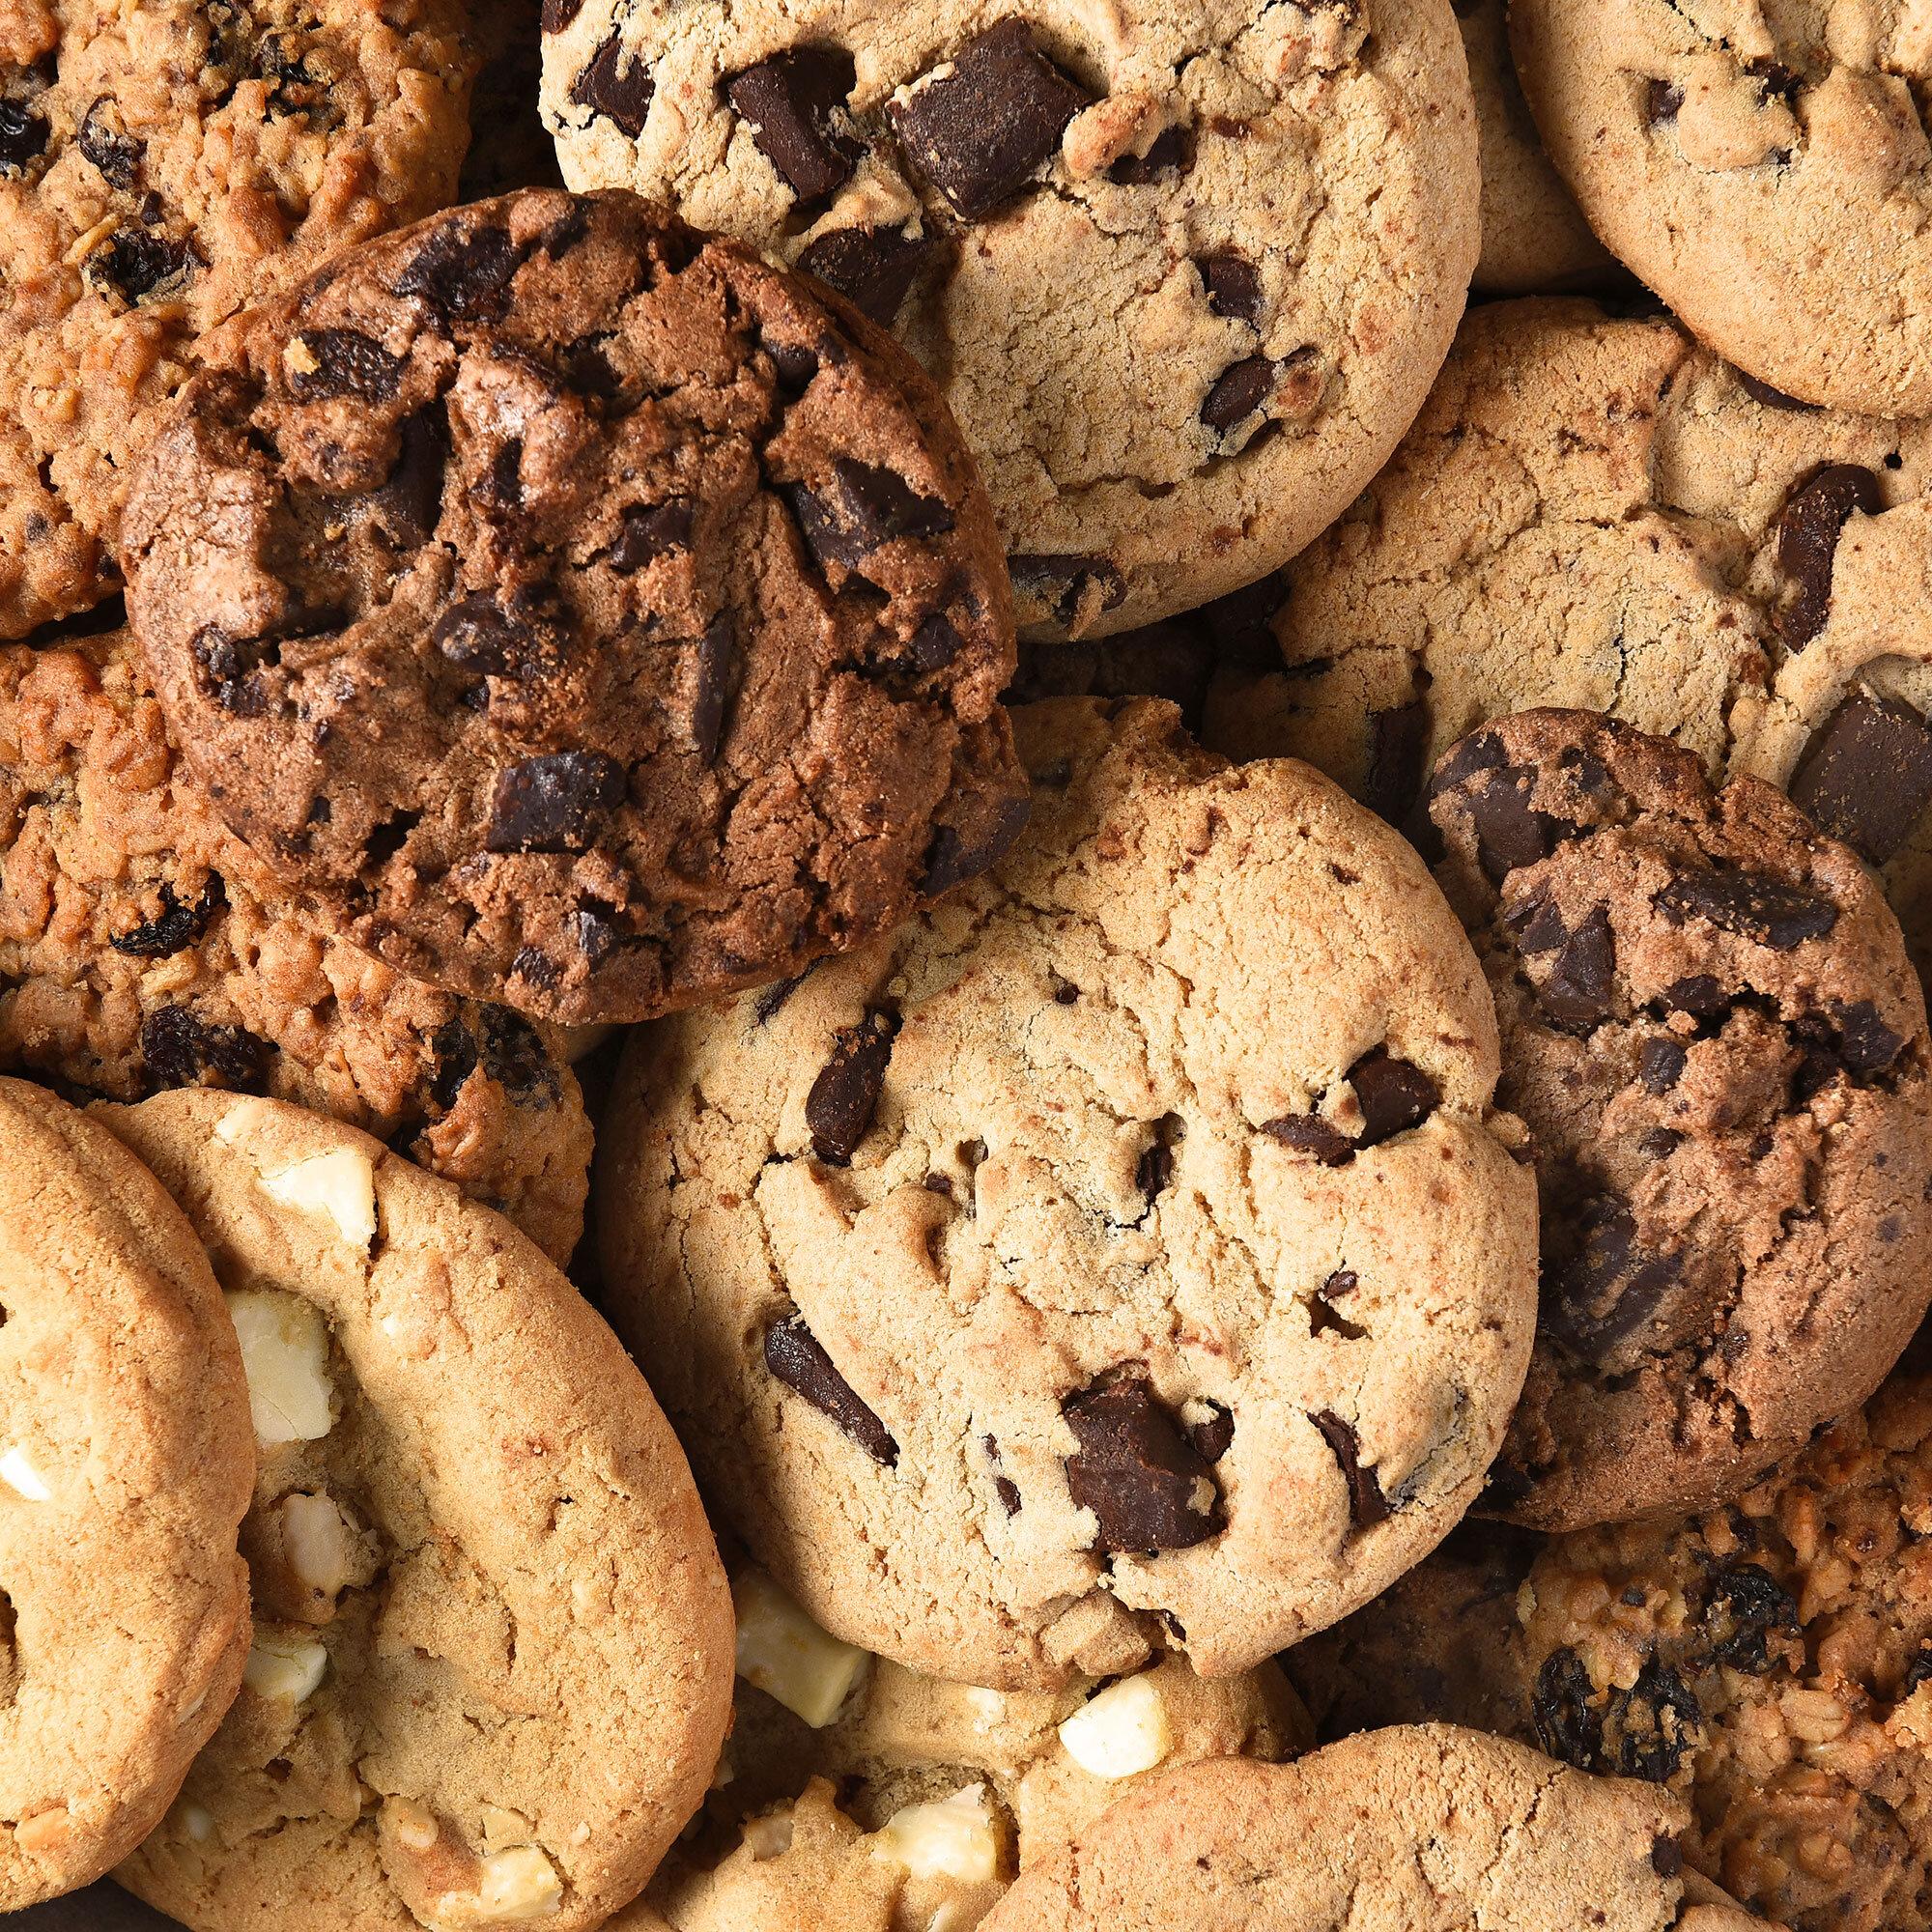 https://www.shirtstore.fi/pub_docs/files/Cookies/CookiesShirtstore.jpg